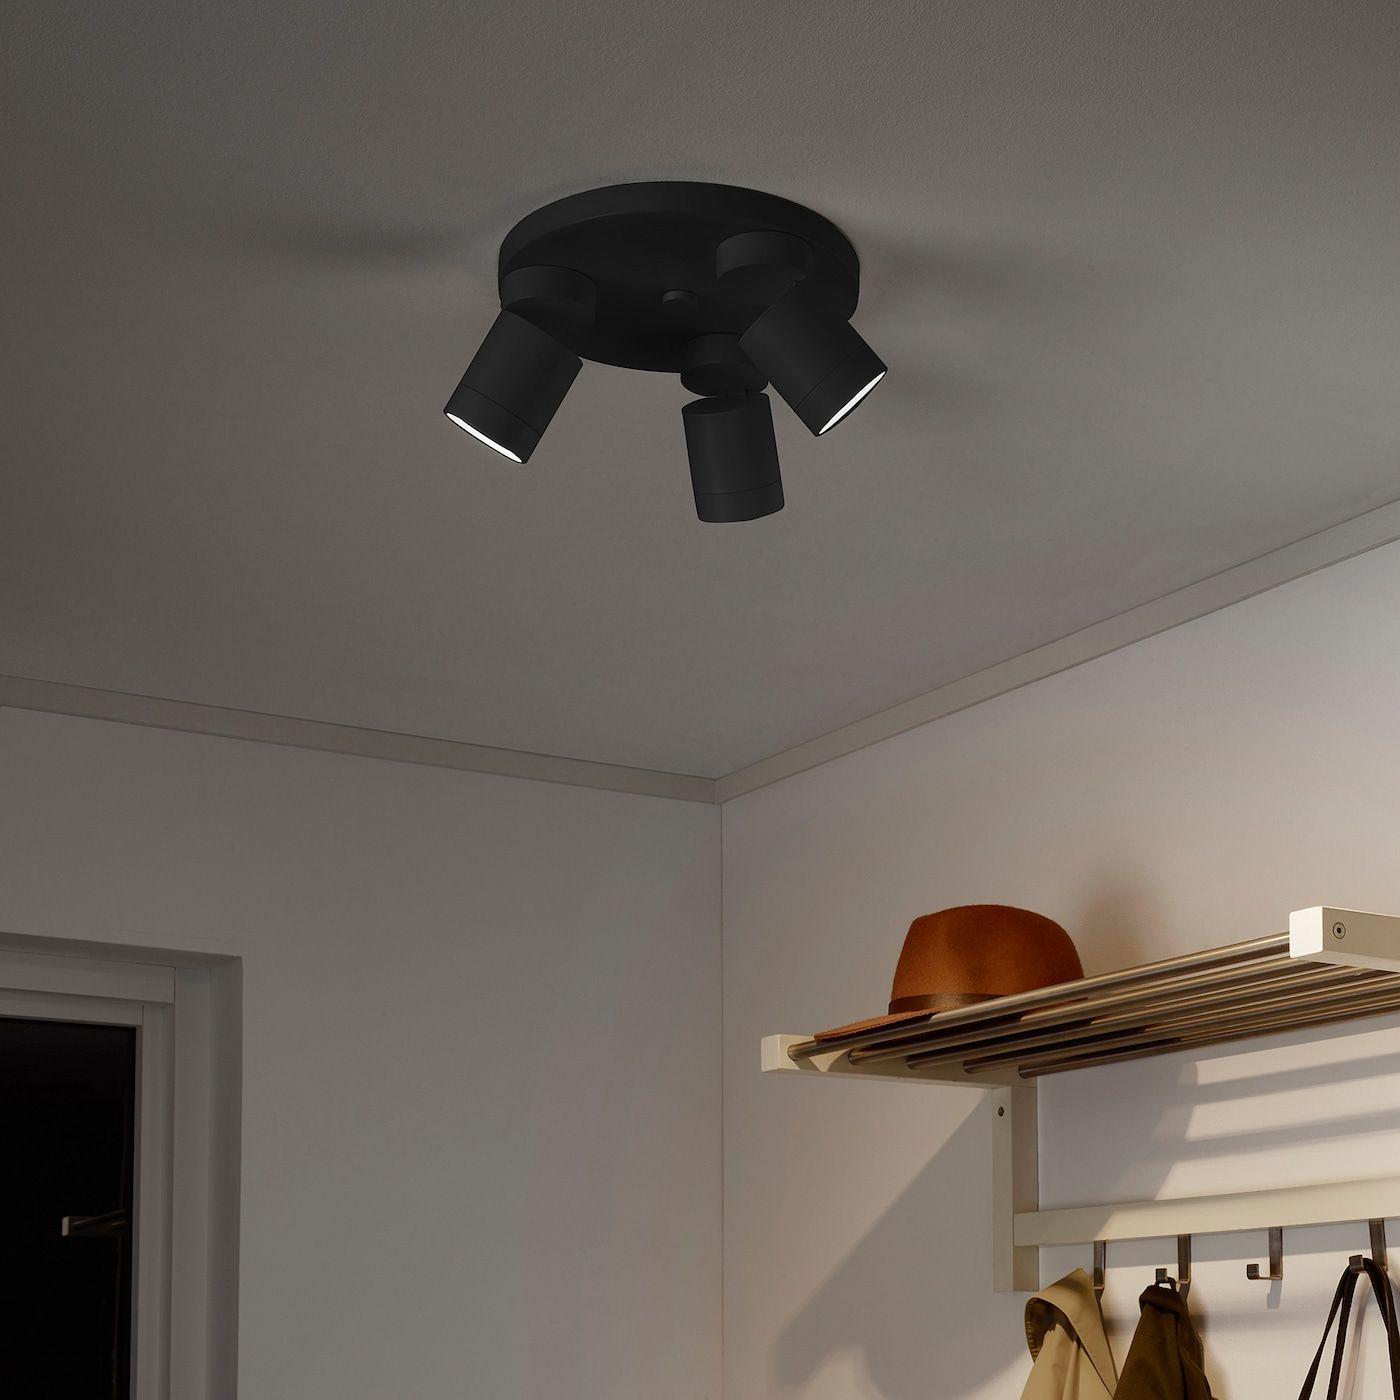 Nymane Ceiling Spotlight With 3 Lights Anthracite Ikea In 2020 Ceiling Spotlights Living Room Light Fixtures Room Lights